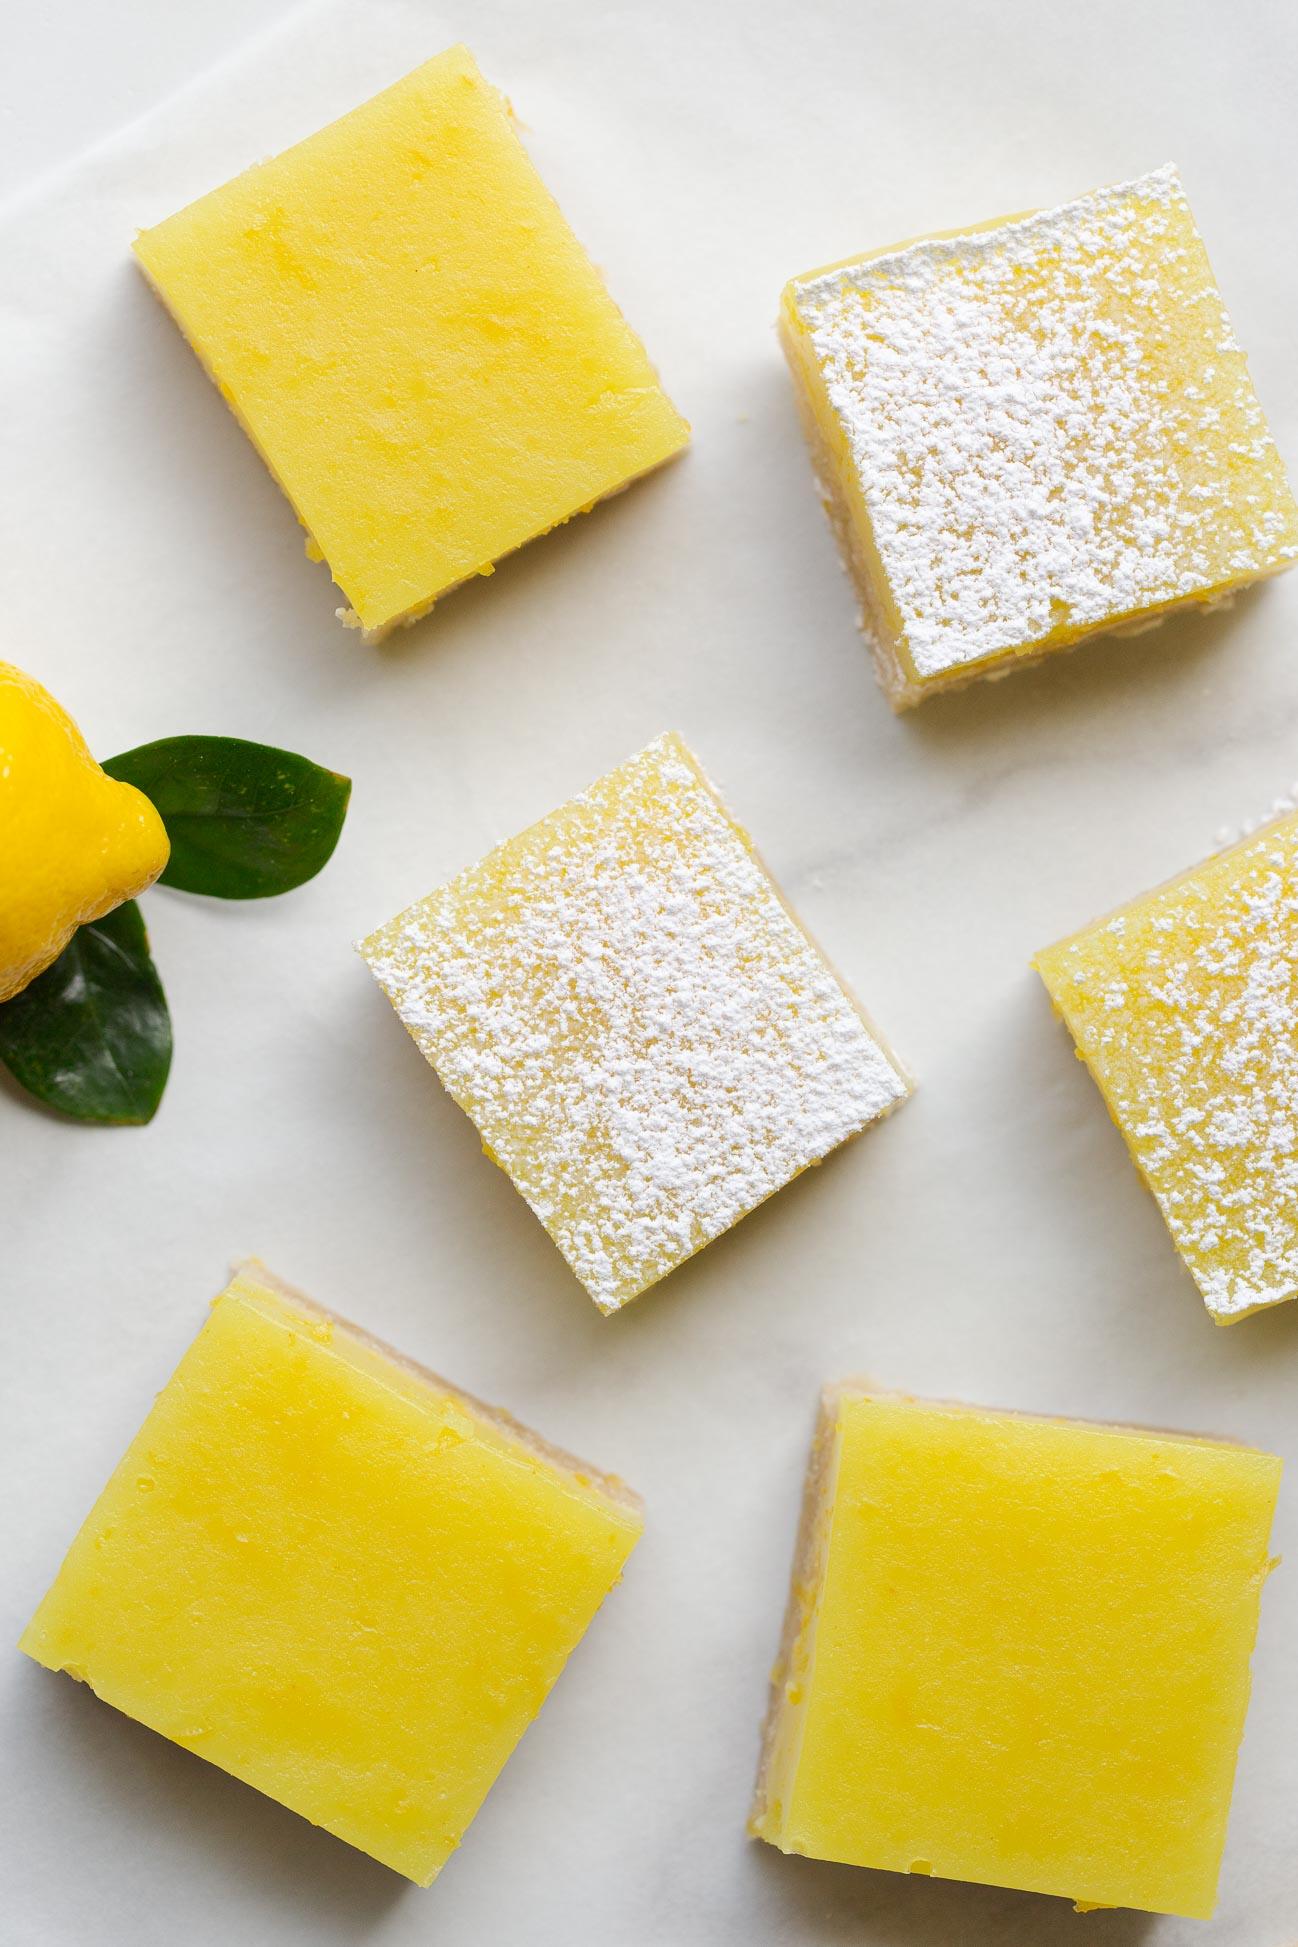 Easy lemon bars with shortbread crust